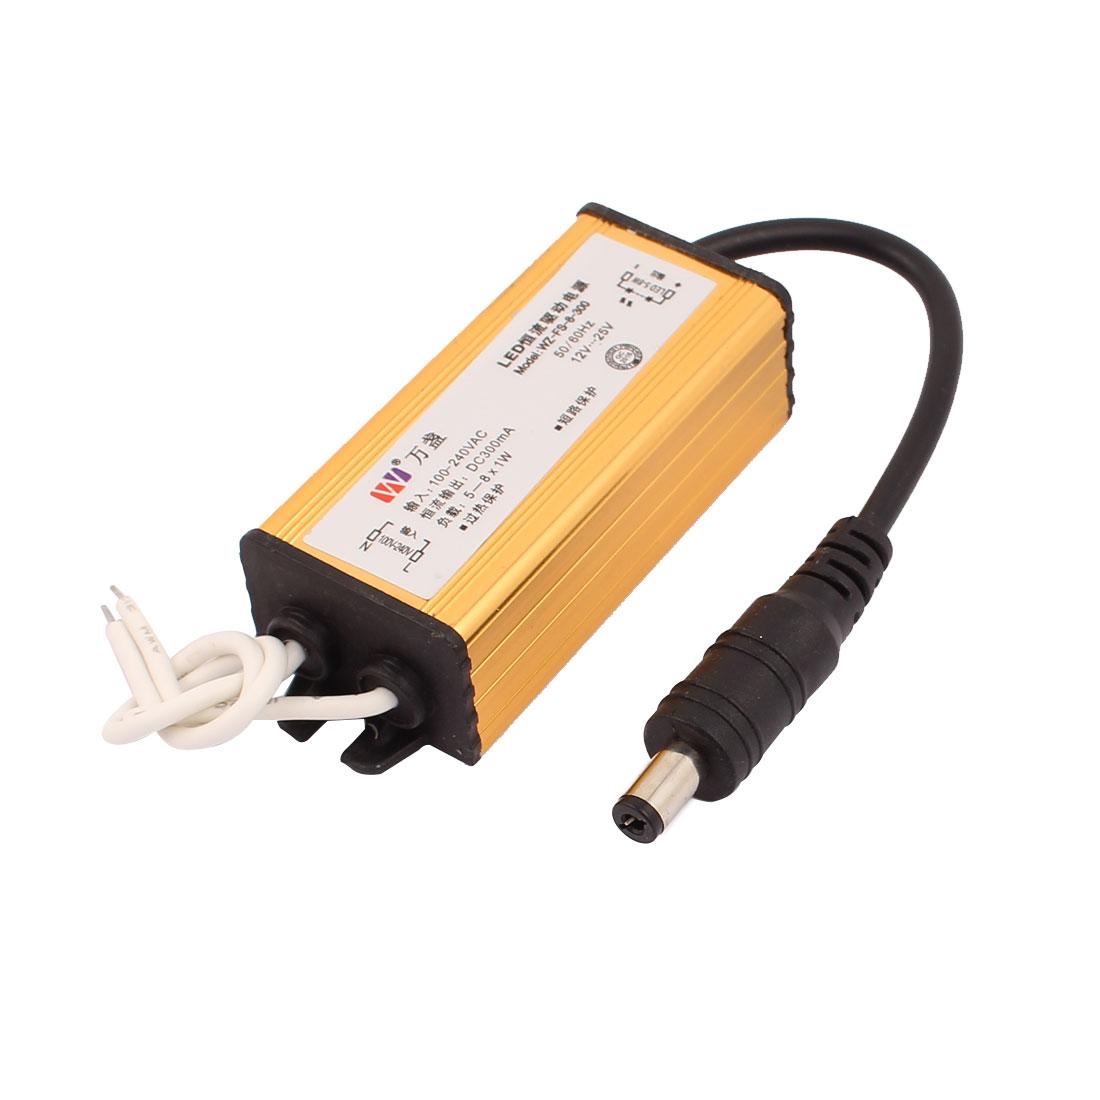 AC 100-240V 5~8W LED Light Driver Waterproof Power Supply Output DC 300mA